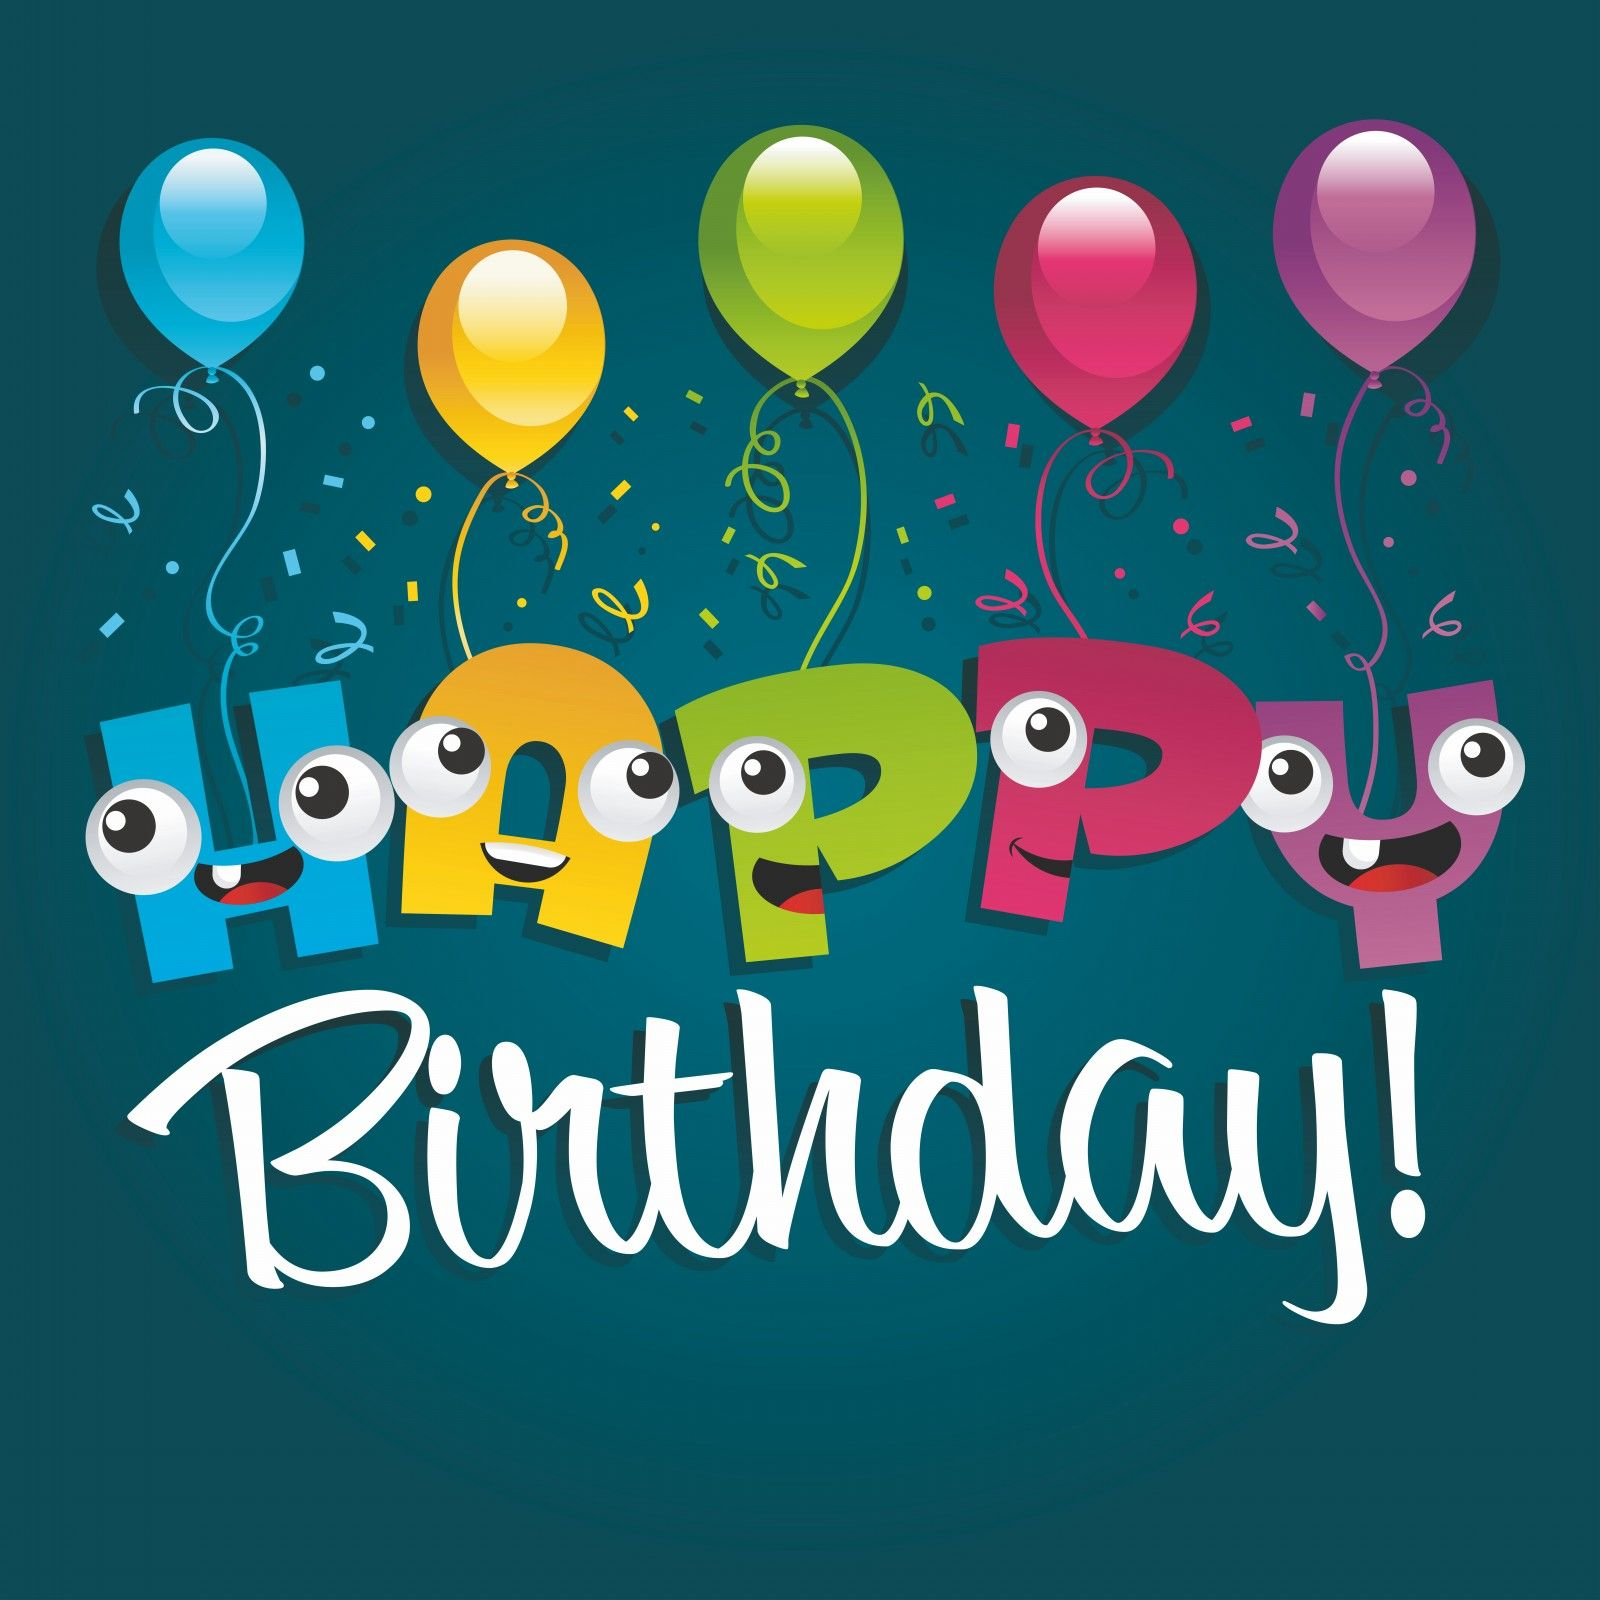 Happy-Birthday-Cards3.jpg   Holiday & Birthday Wishes ect ...